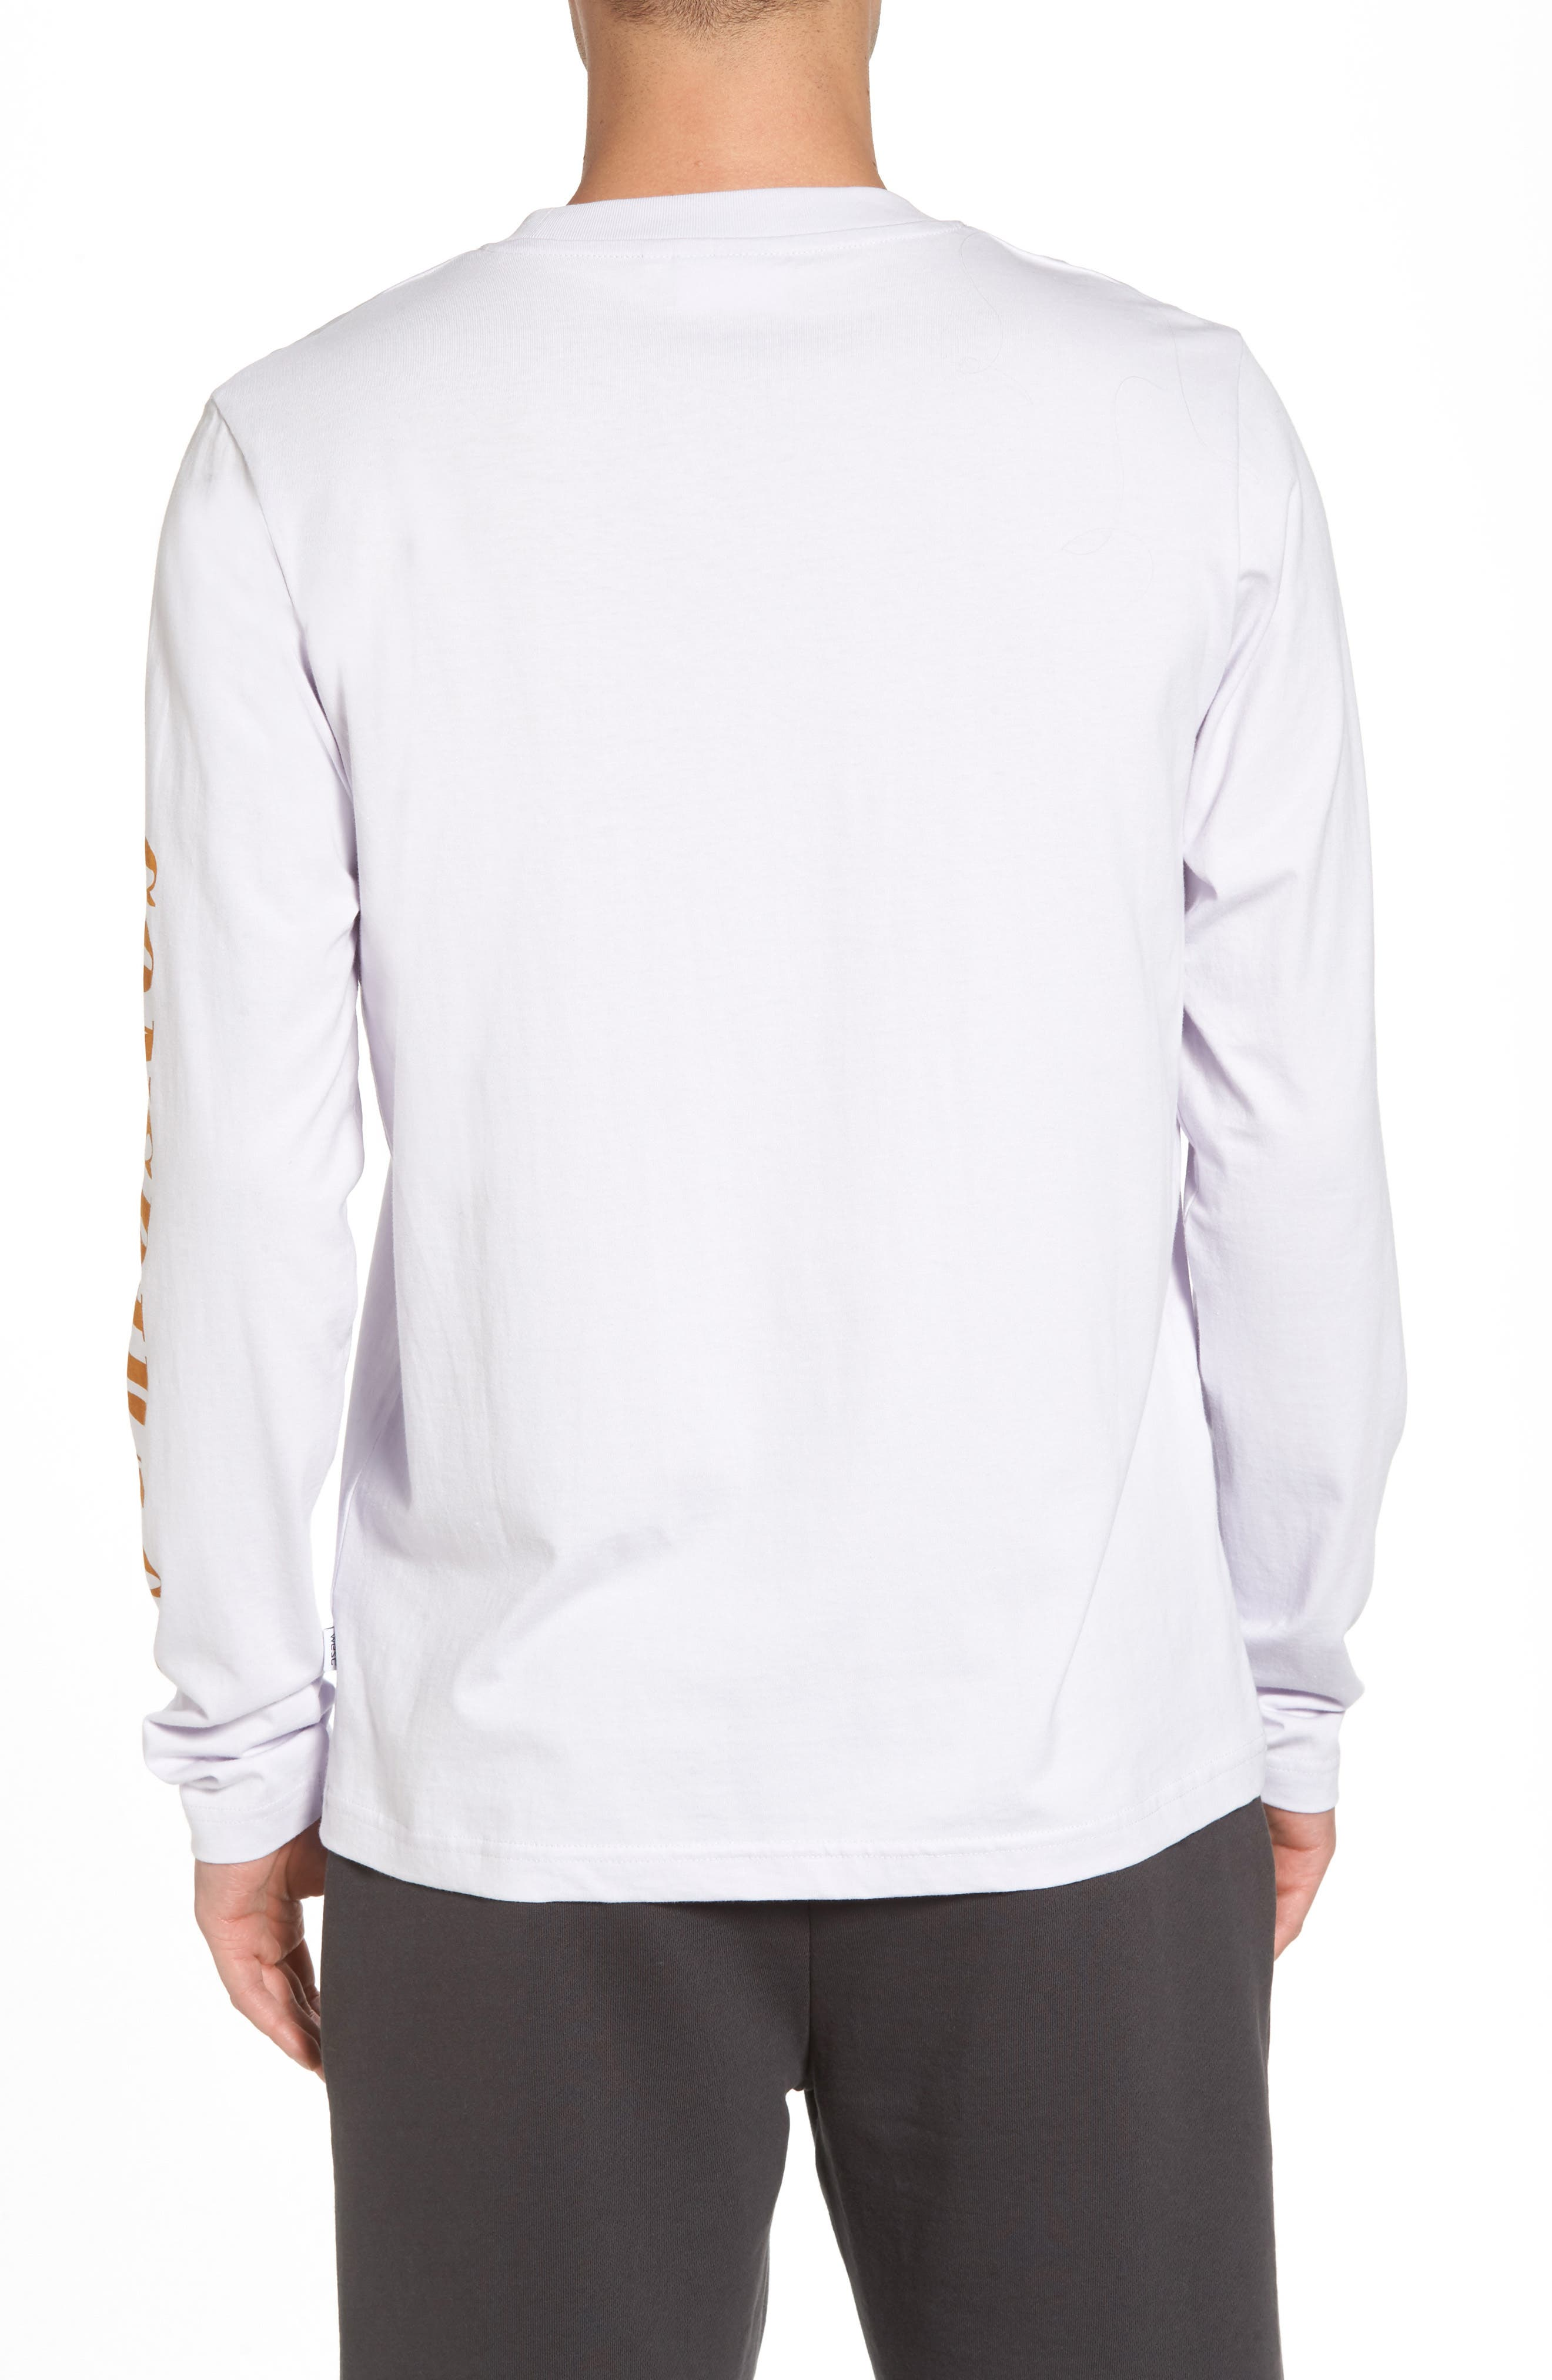 Makai Graphic T-Shirt,                             Alternate thumbnail 2, color,                             530